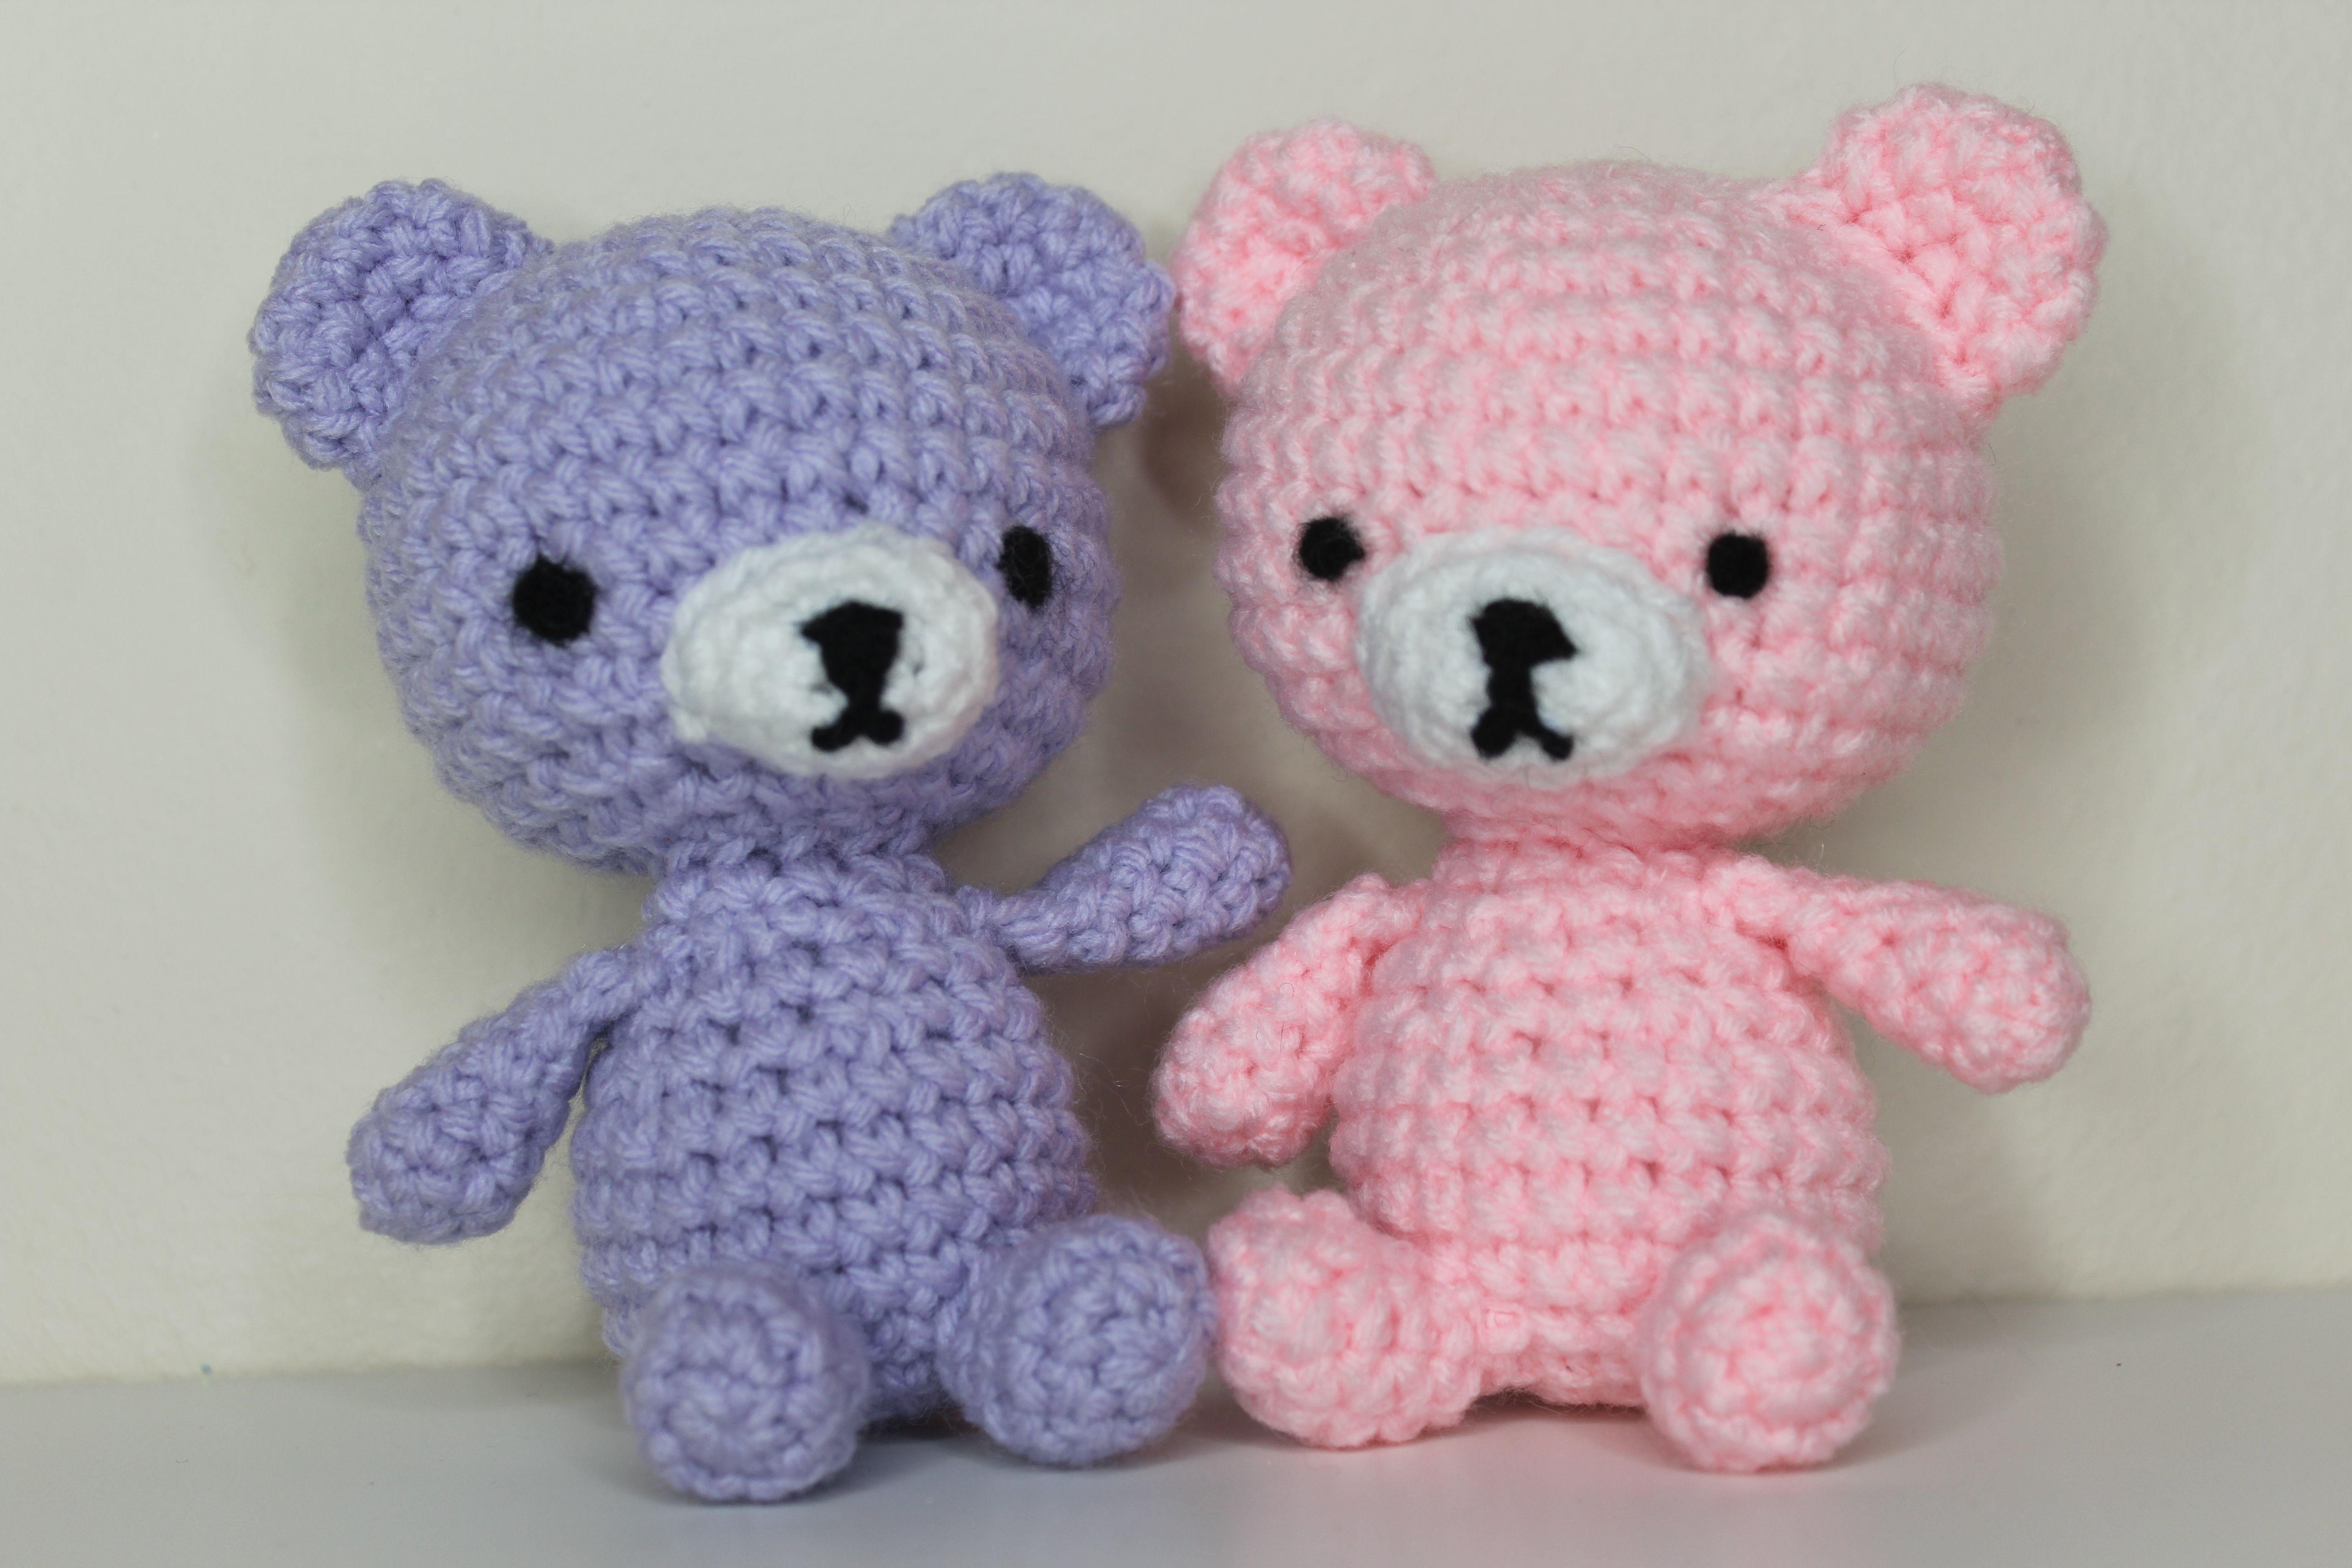 Mini Teddy Bear Keychain Free Crochet Pattern – Crochetfuldiy.com | 3456x5184